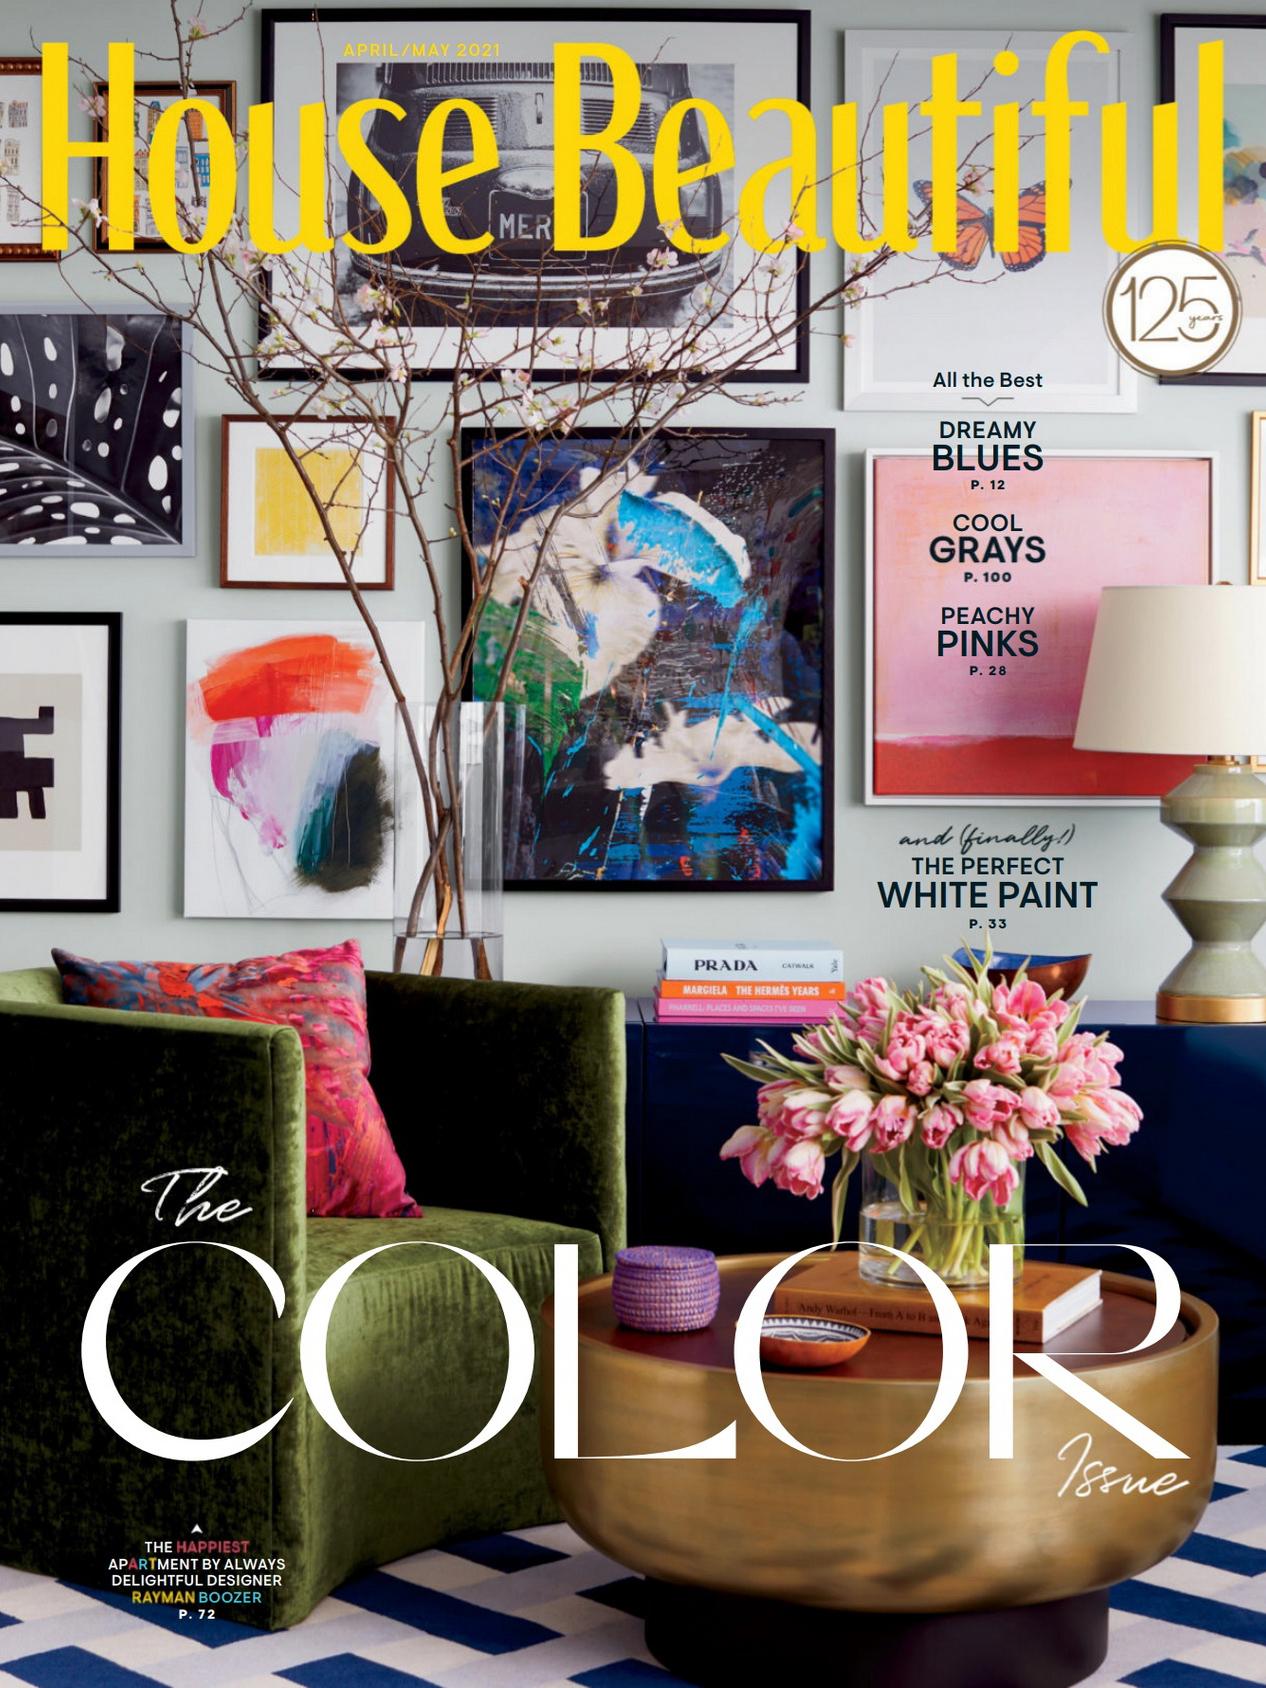 《House Beautiful》美国版家纺杂志2021年04-05月号